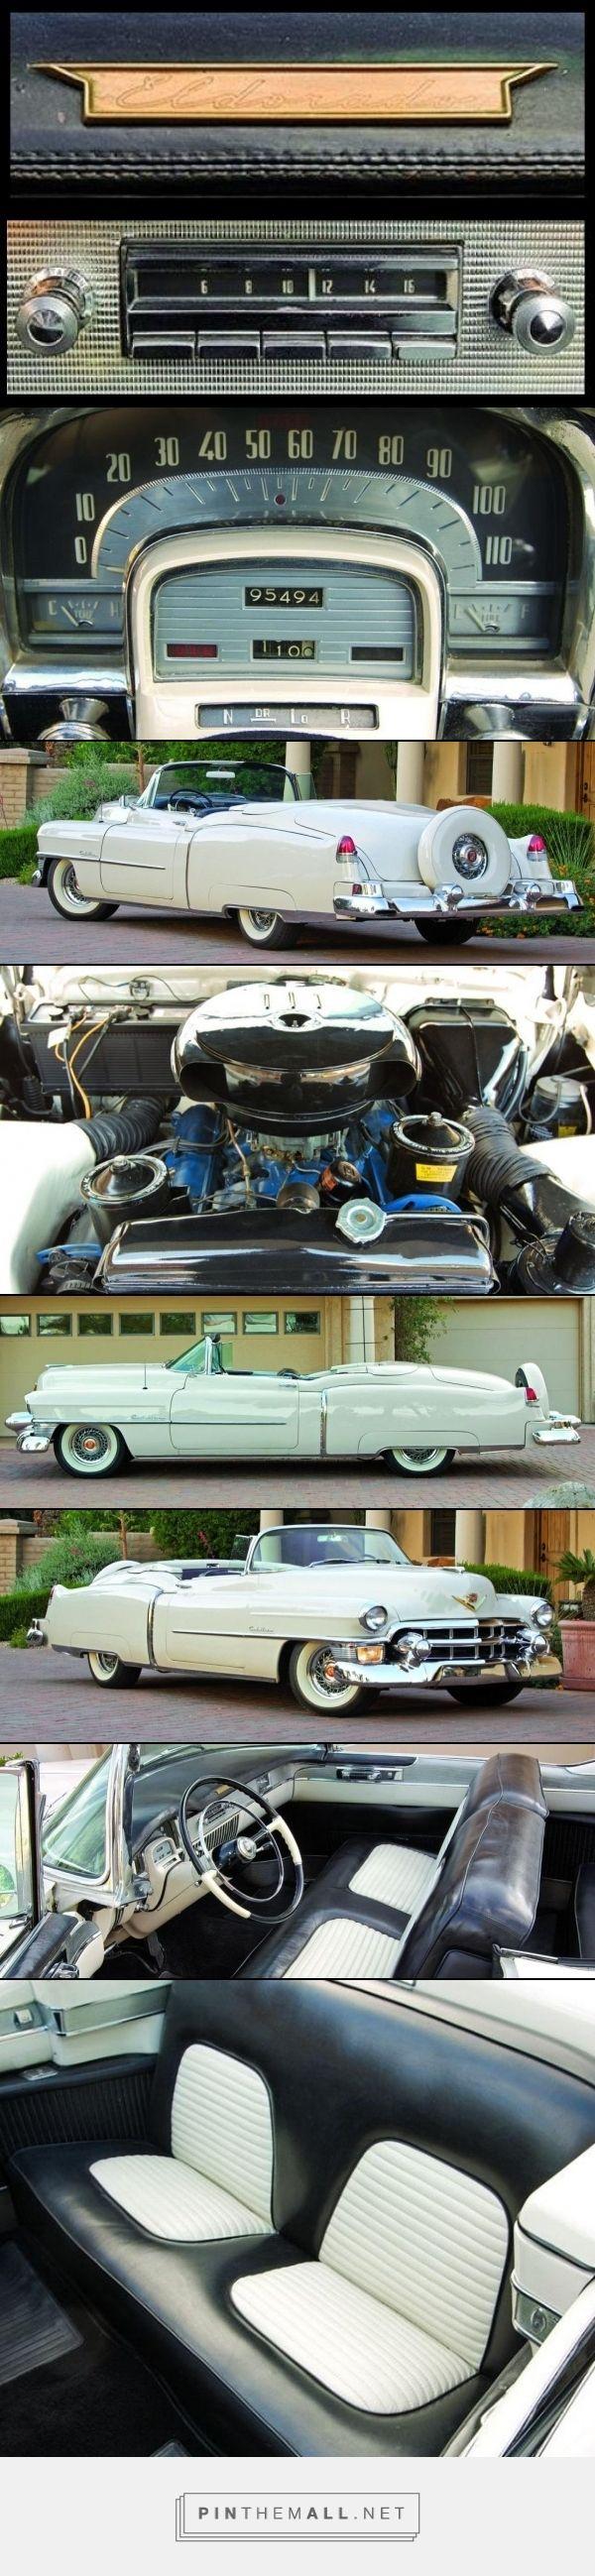 1953 CADILLAC ELDORADO Body Style: Two-door, four-seat convertible Engine Type…